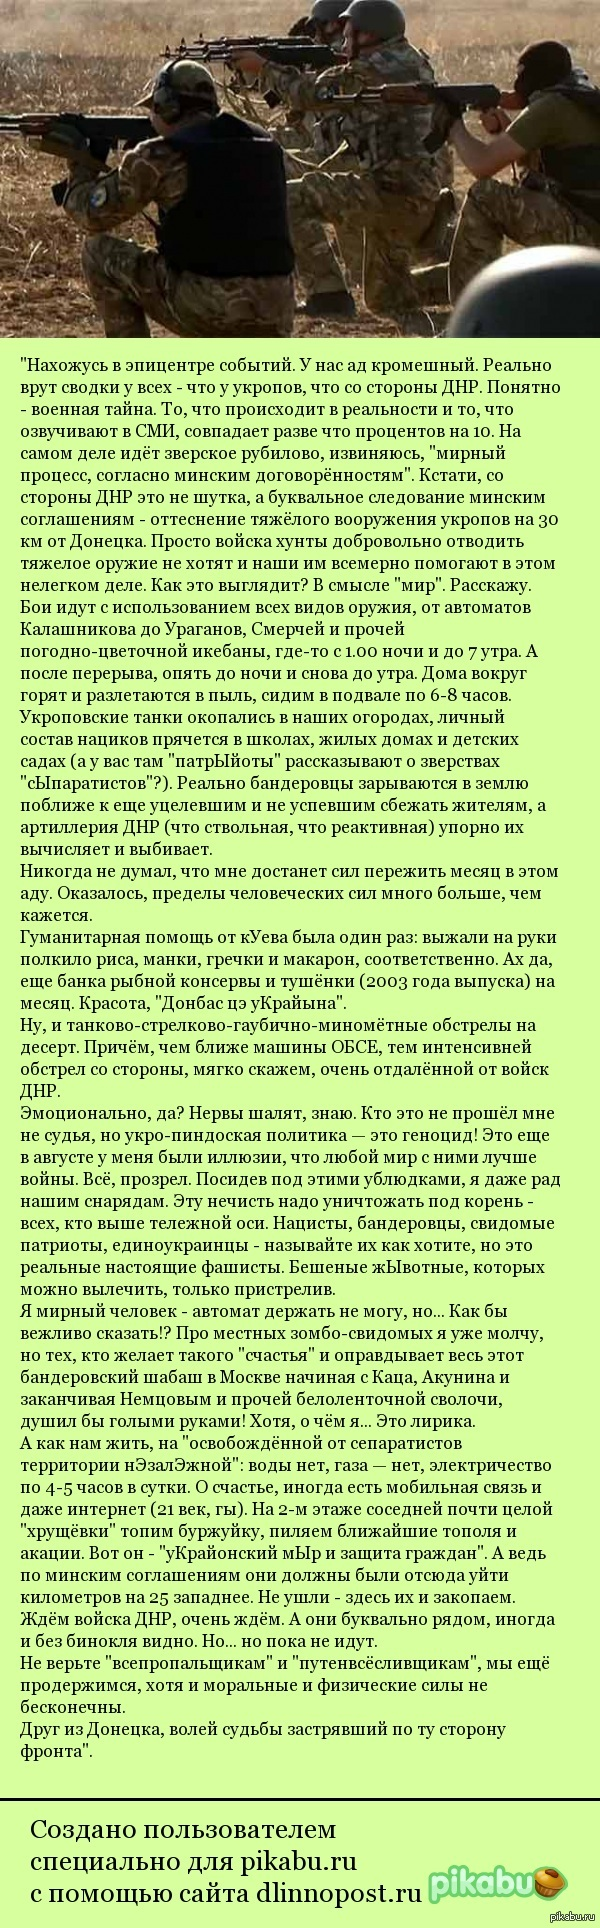 http://s5.pikabu.ru/post_img/2014/11/24/9/1416841055_16857743.jpg